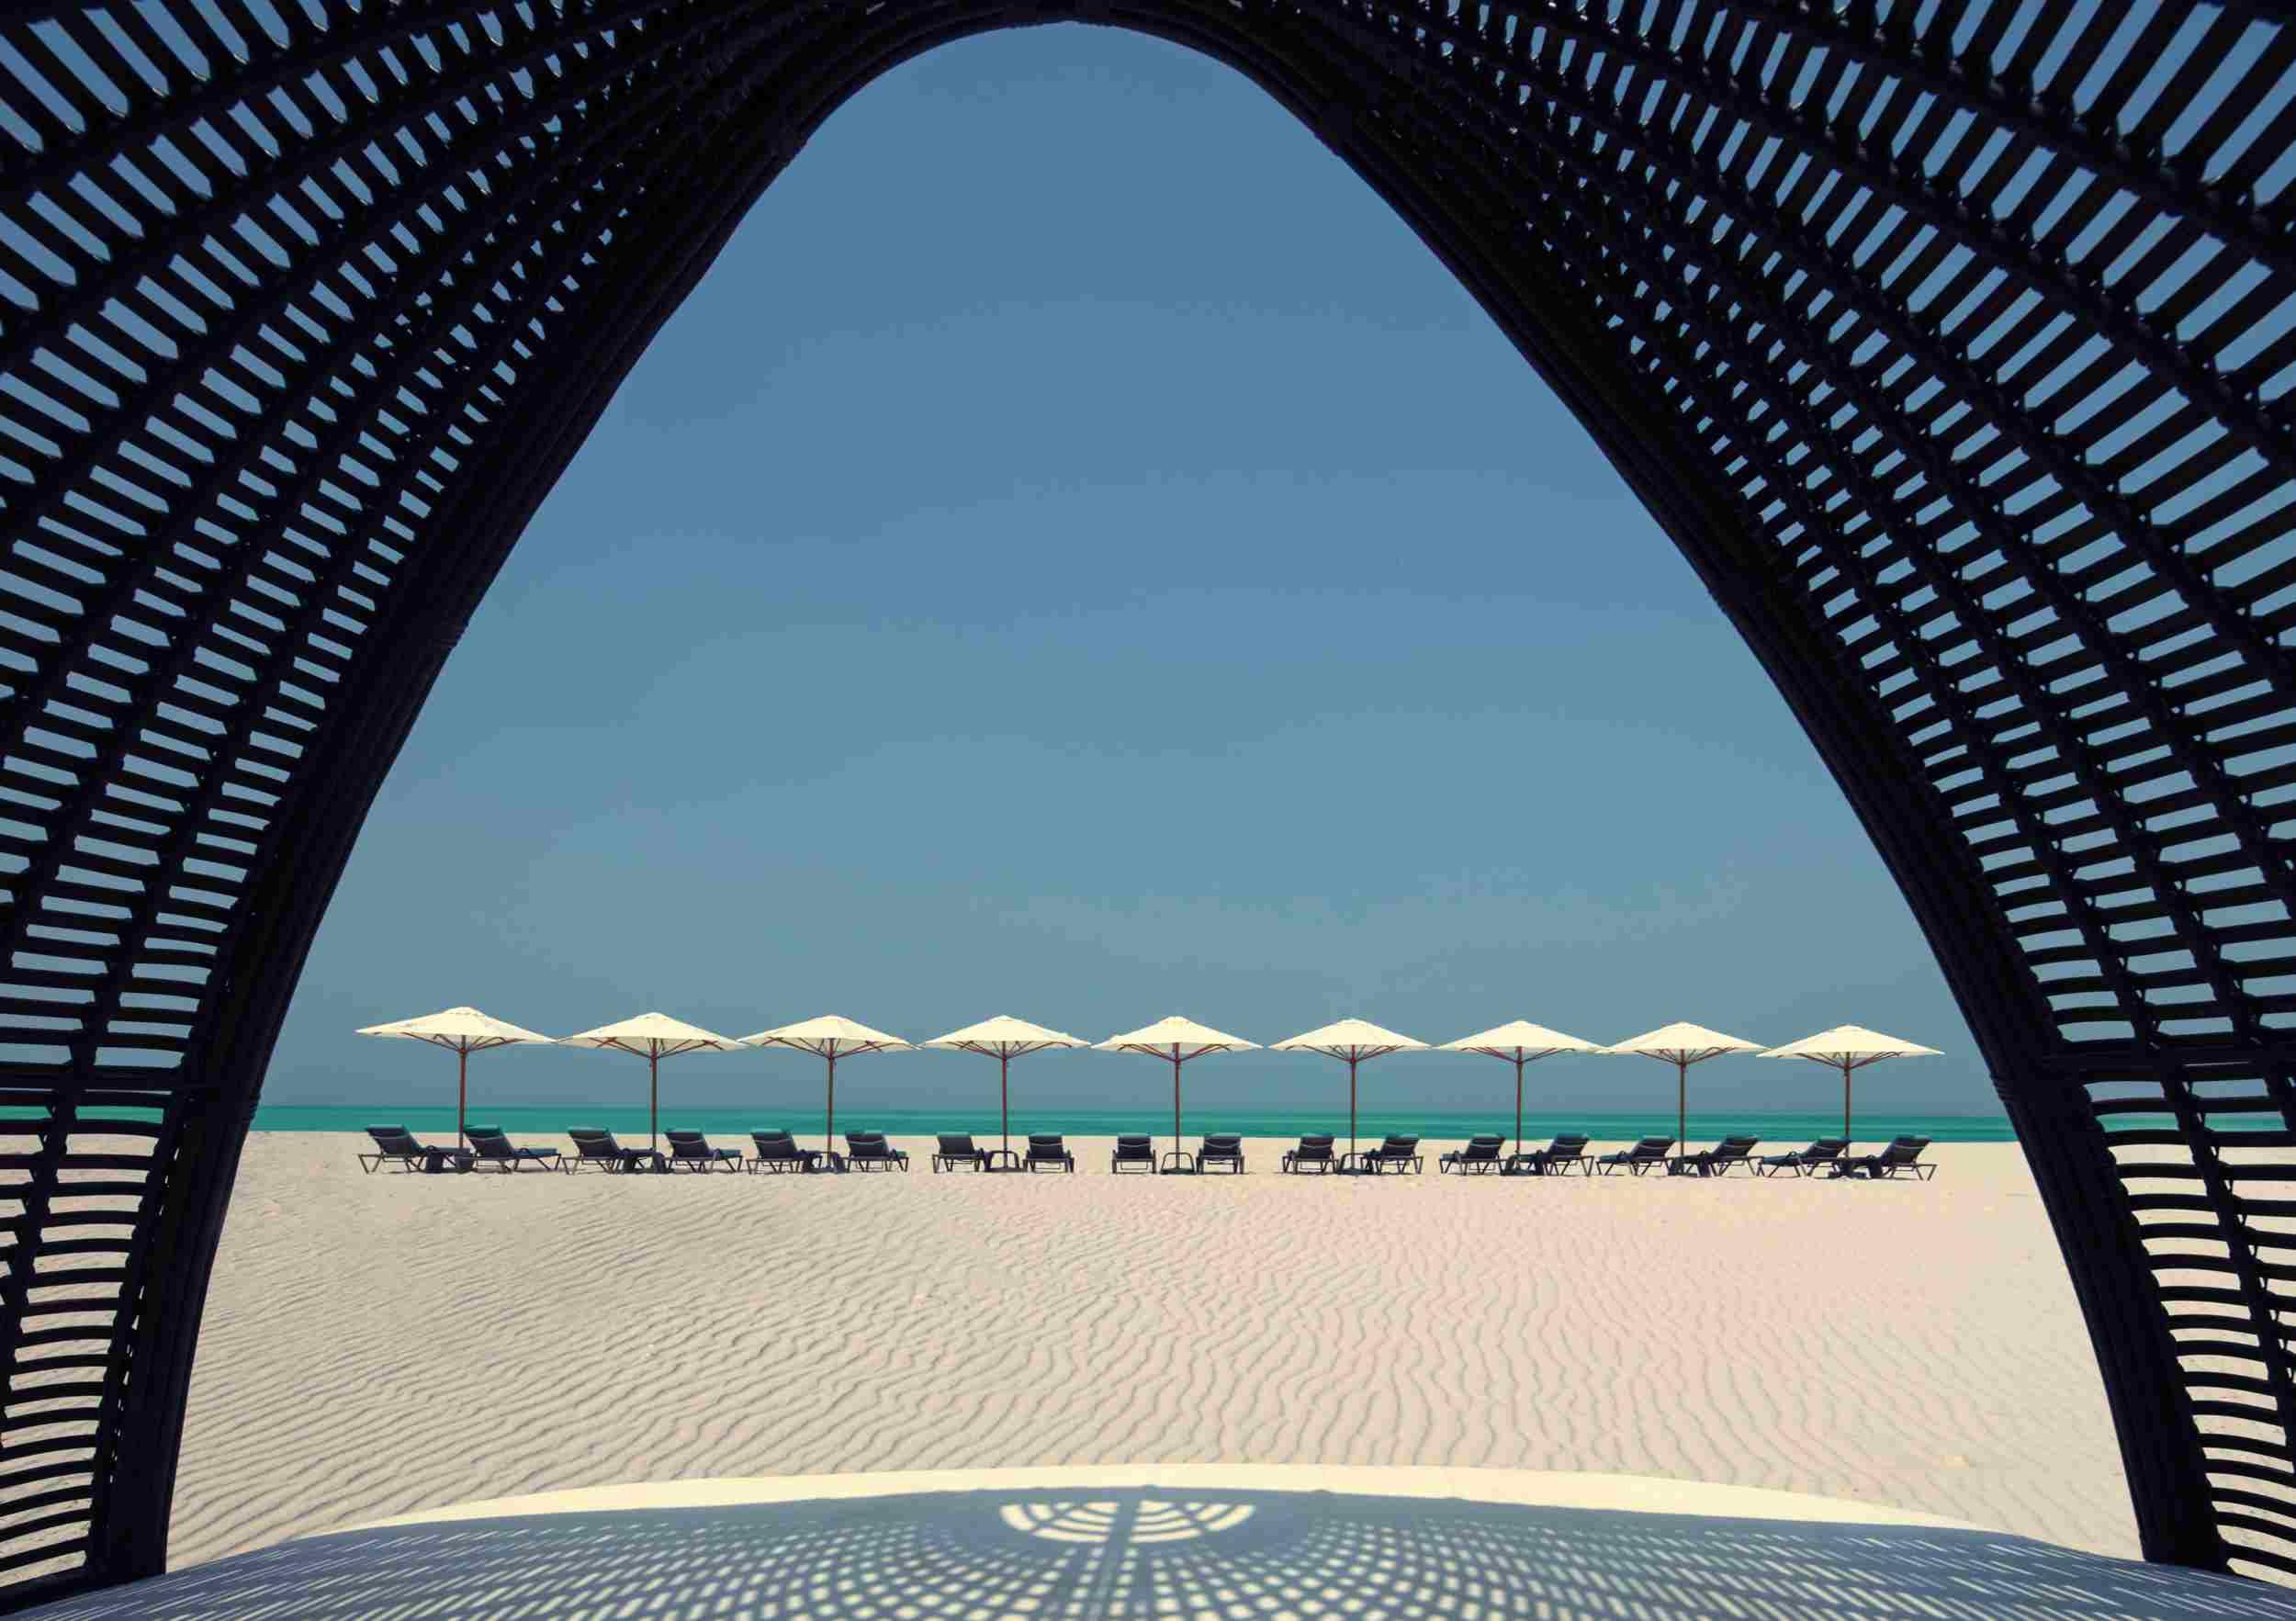 Arabian Gulf seen from the St. Regis Saayidat Island Resort